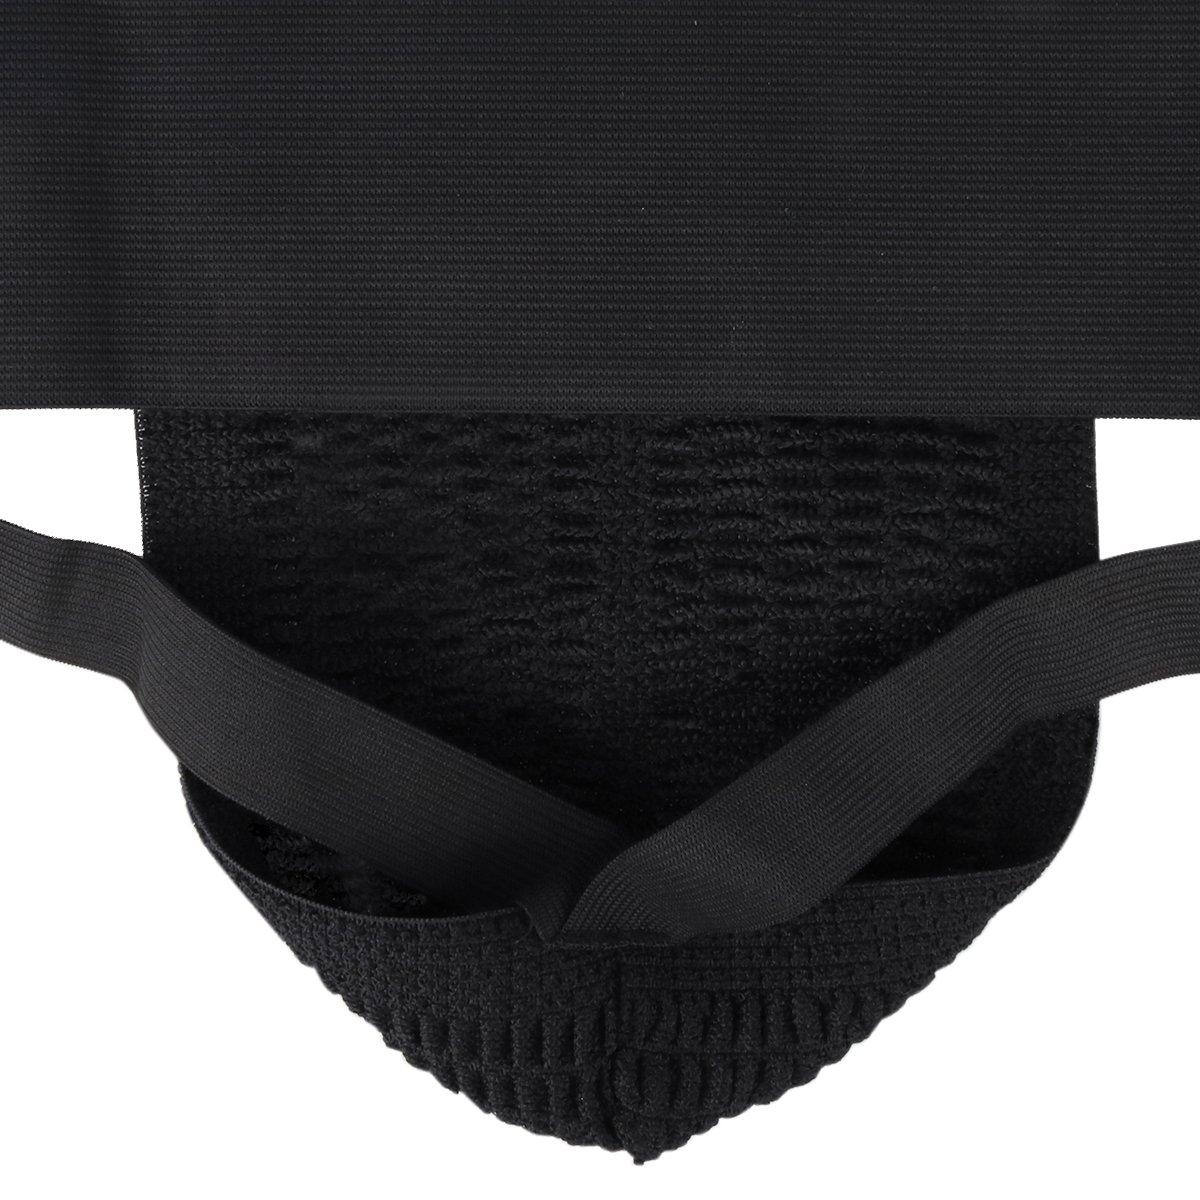 iEFiEL Men Wide Waistband Athletic Supporter Jockstrap Breathable Underwear Black S (Waistline 27.5-39)